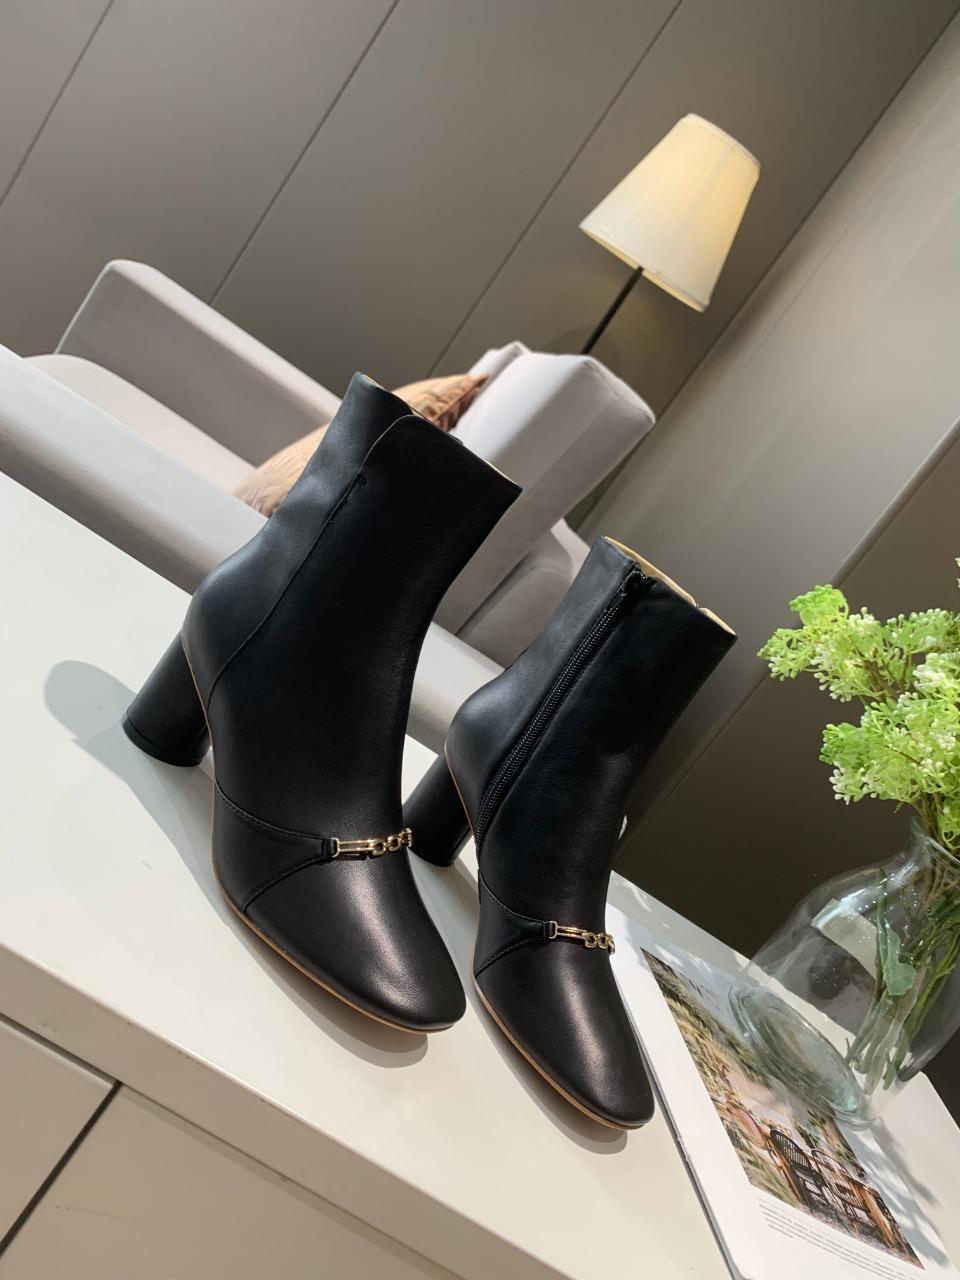 Celine秋冬新款美鞋塞林圆跟系带